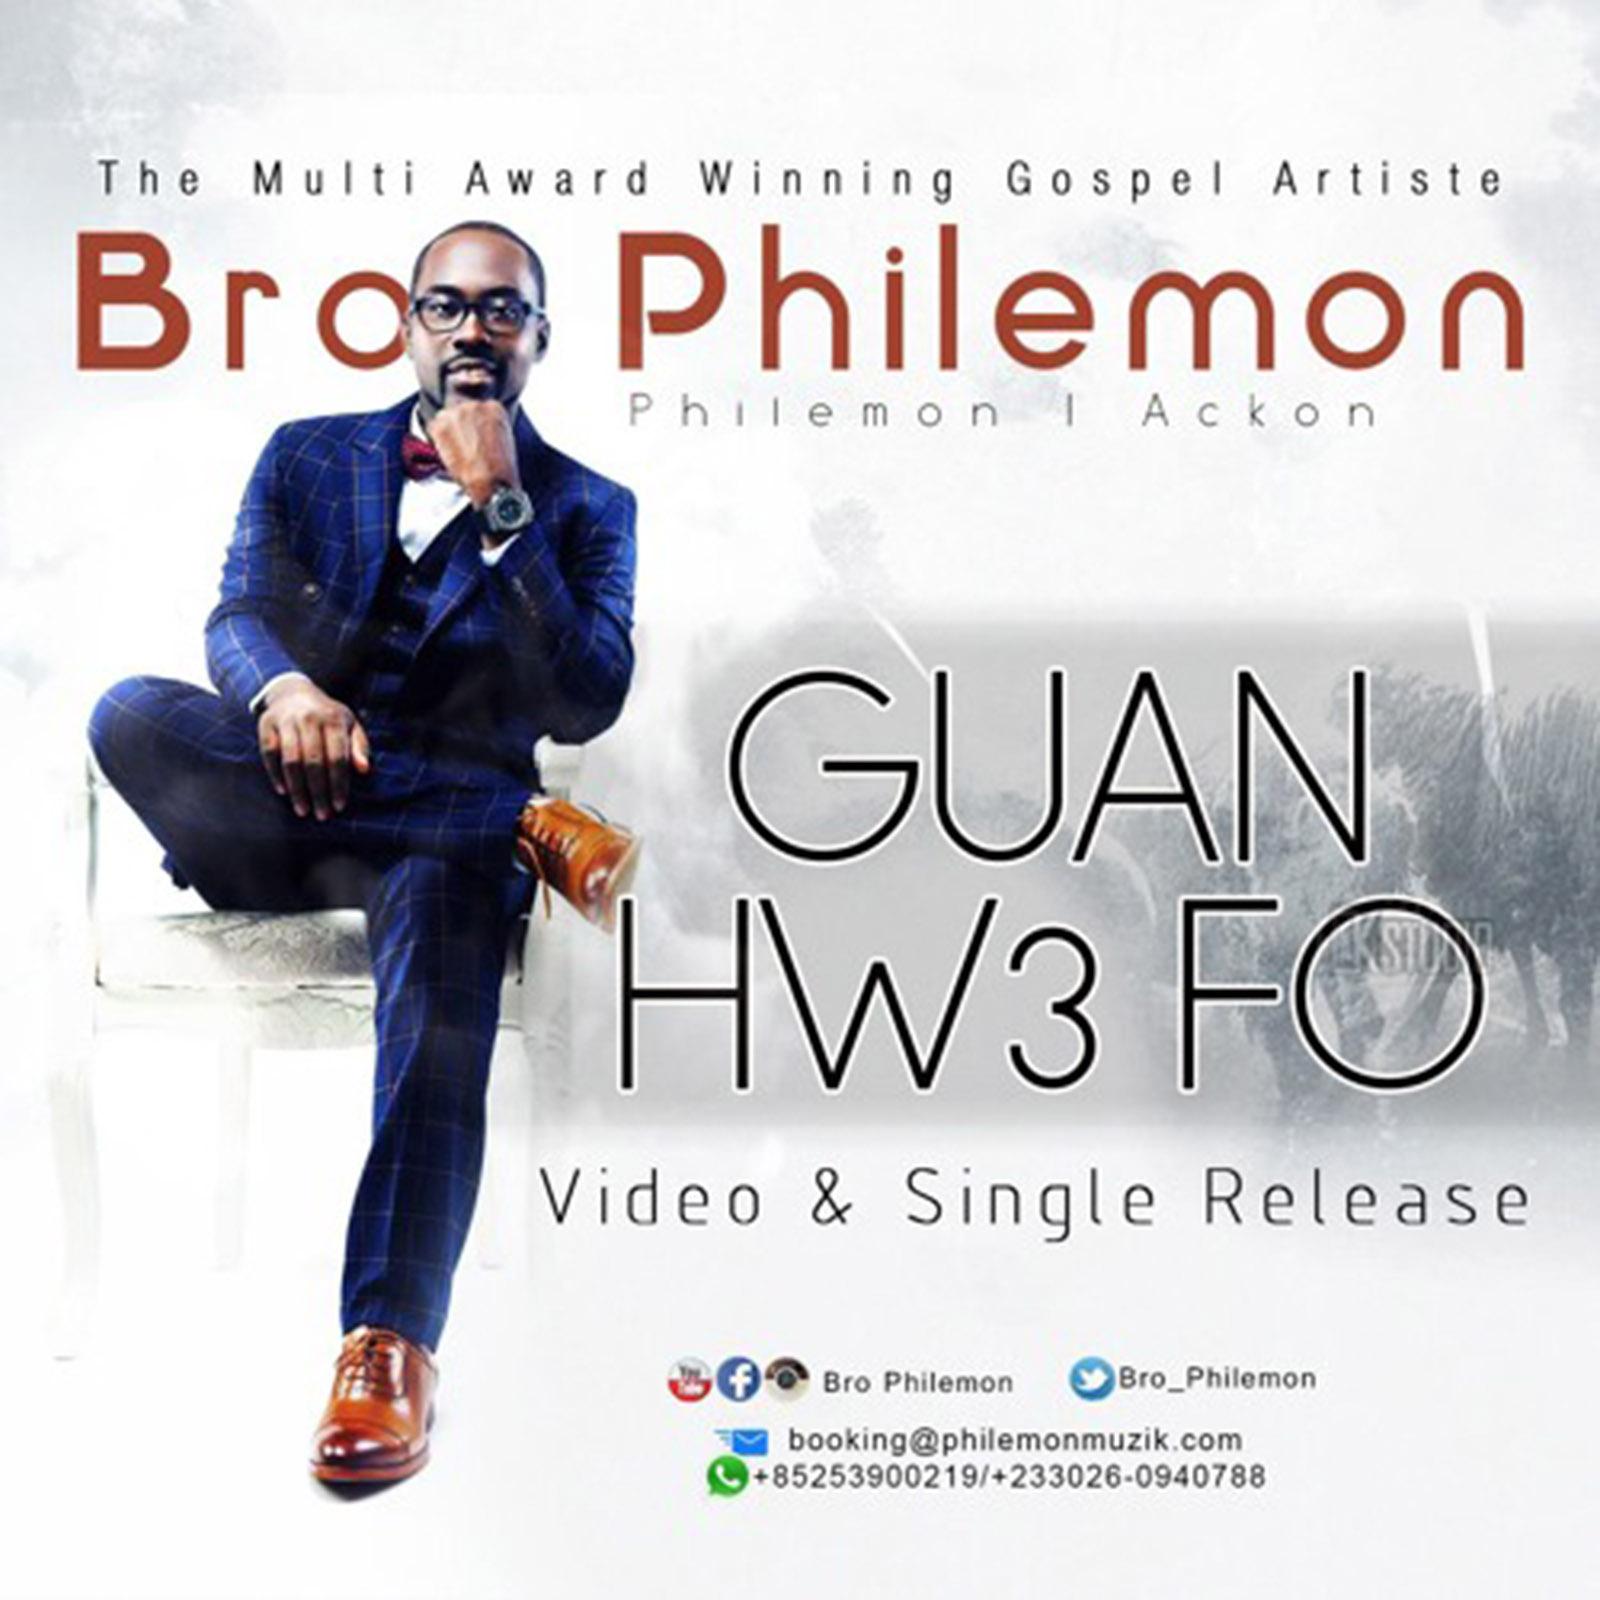 Guan Hw3 Fo by Bro. Philemon